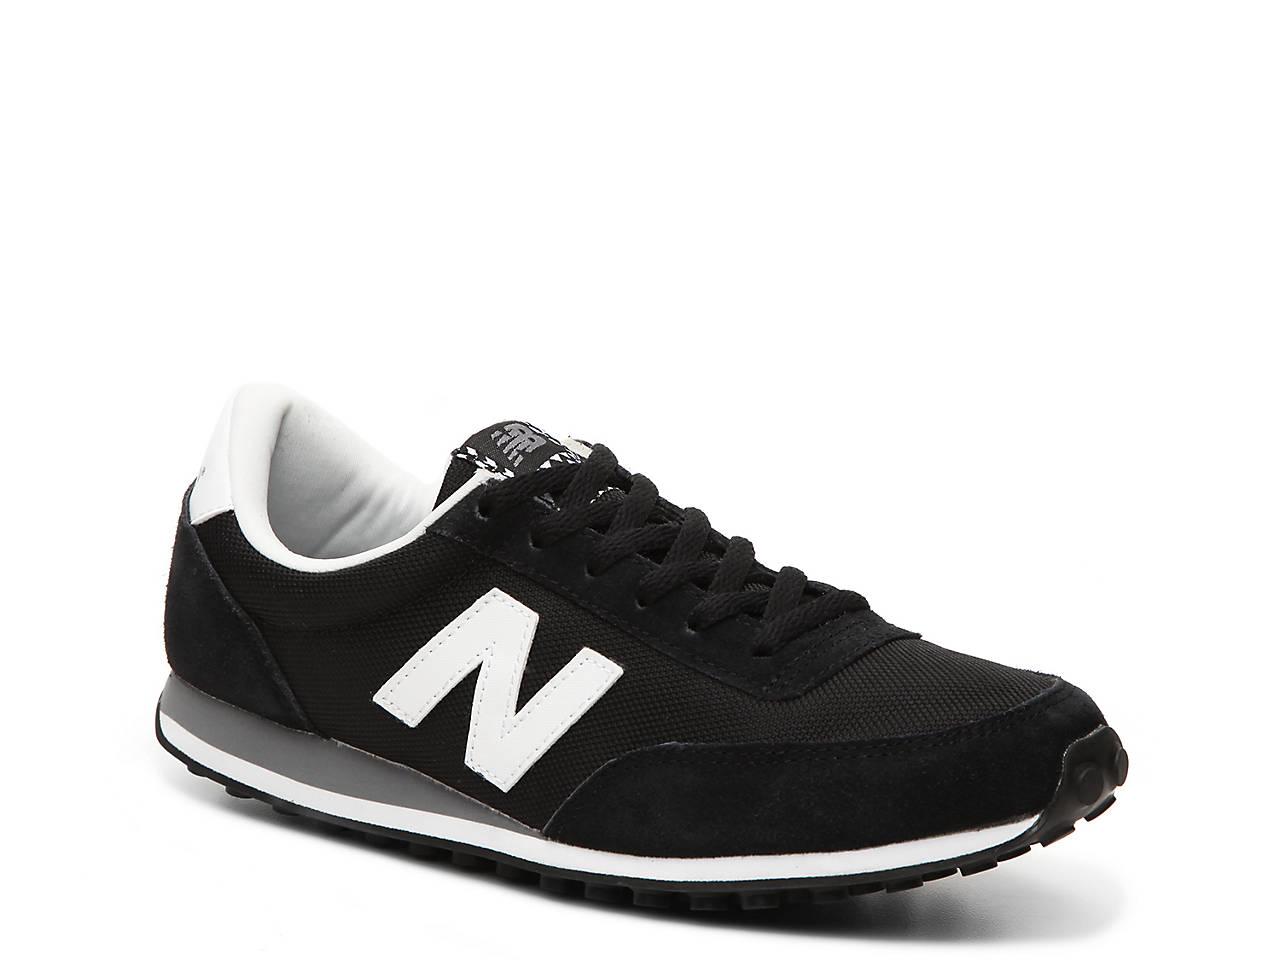 new balance 410 womens. 410 retro sneaker - women\u0027s new balance womens